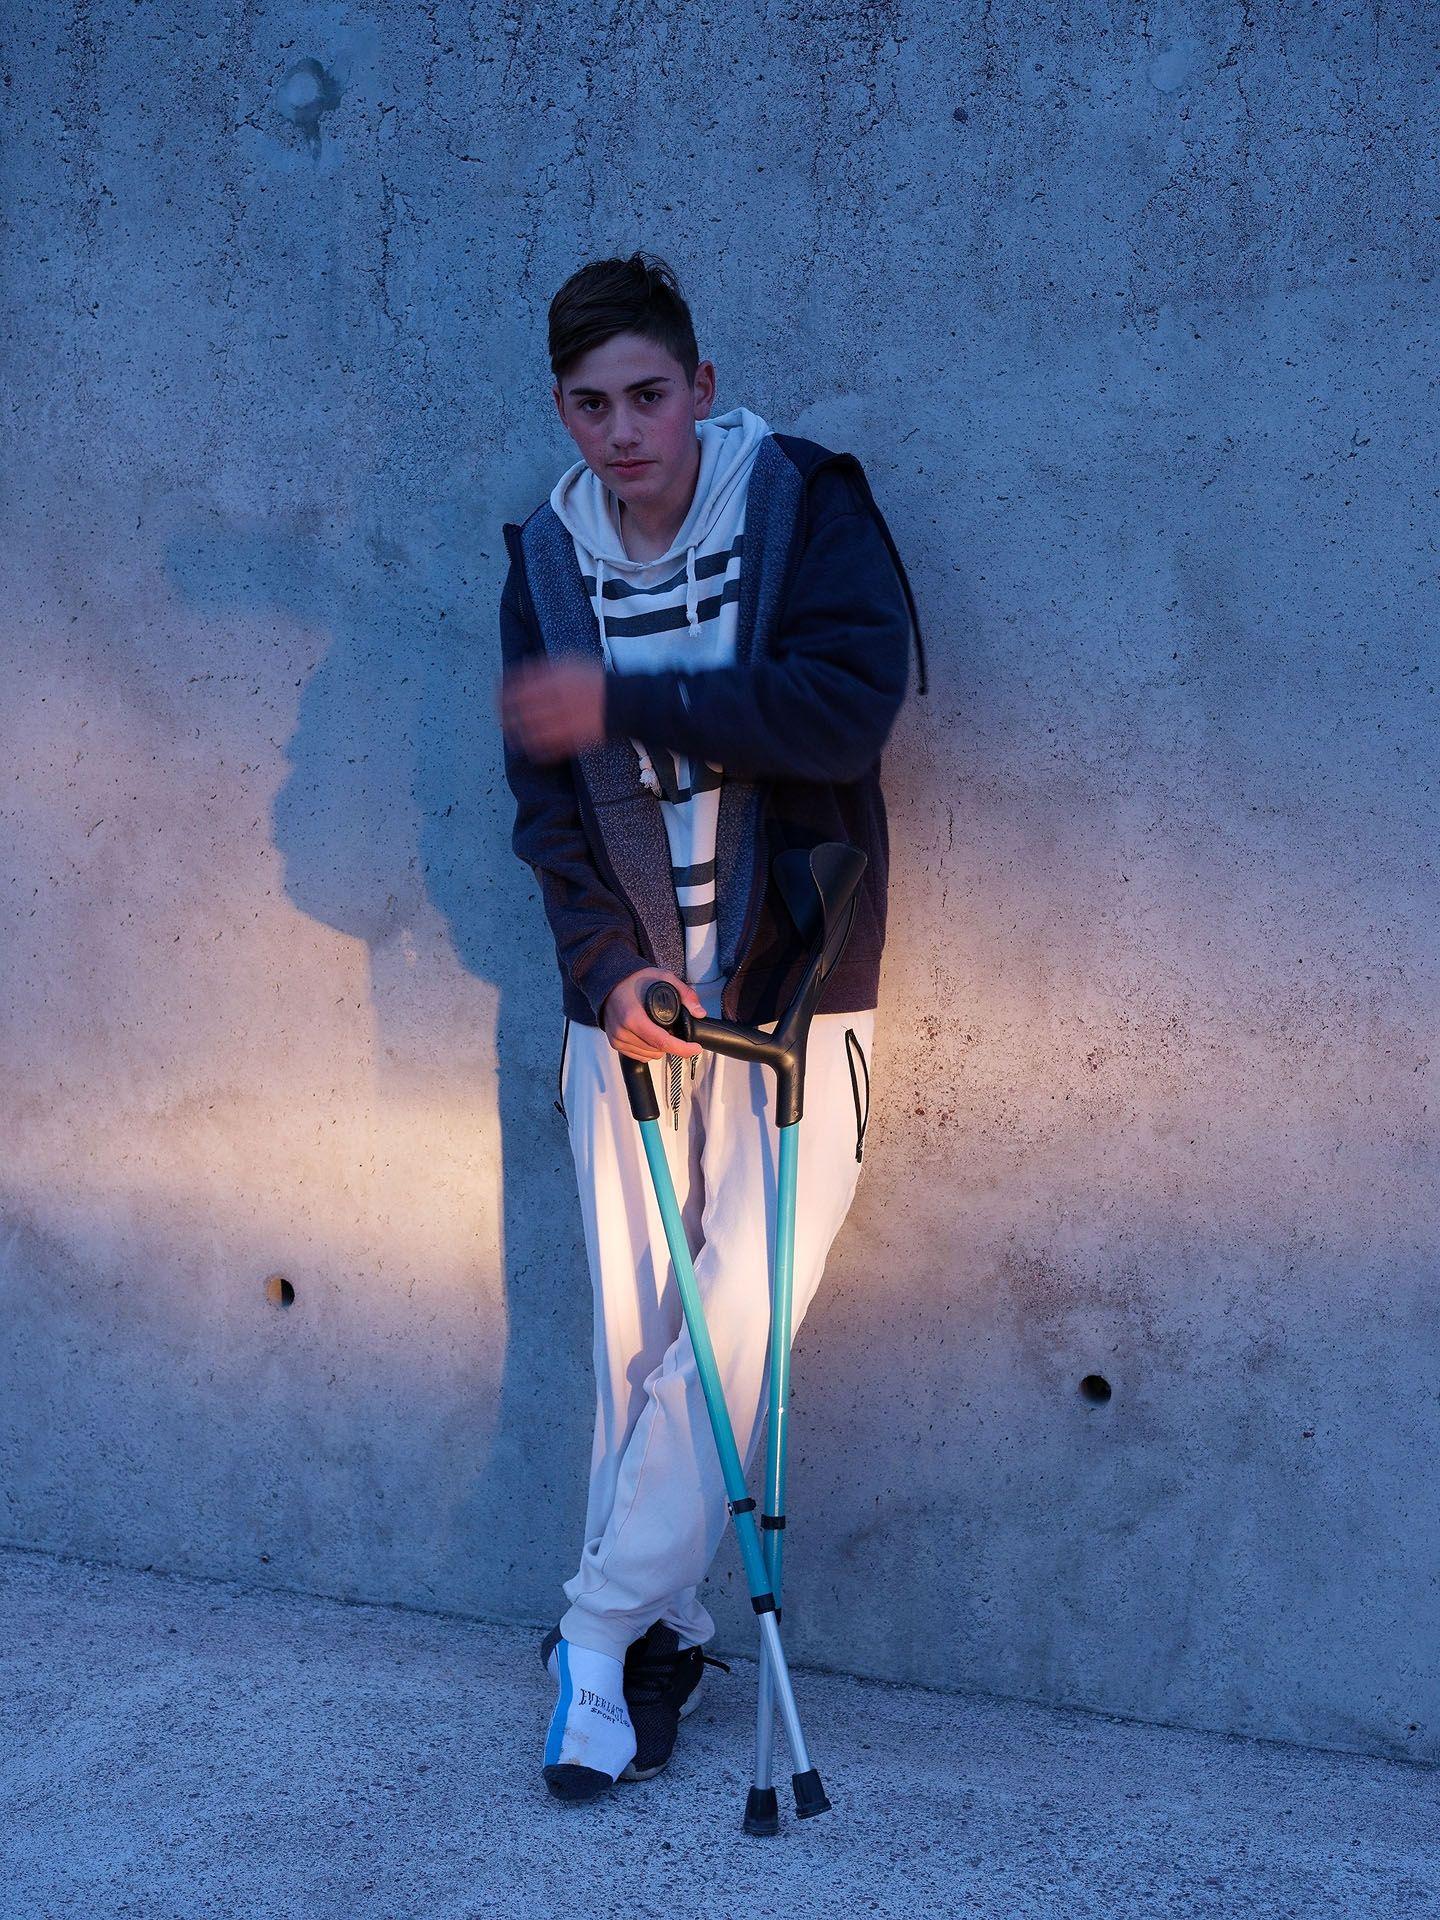 young boy posing against wall using blue crutches by Guillaume Simoneau in Saint-Pierre-et-Miquelon for M le mag Le Monde